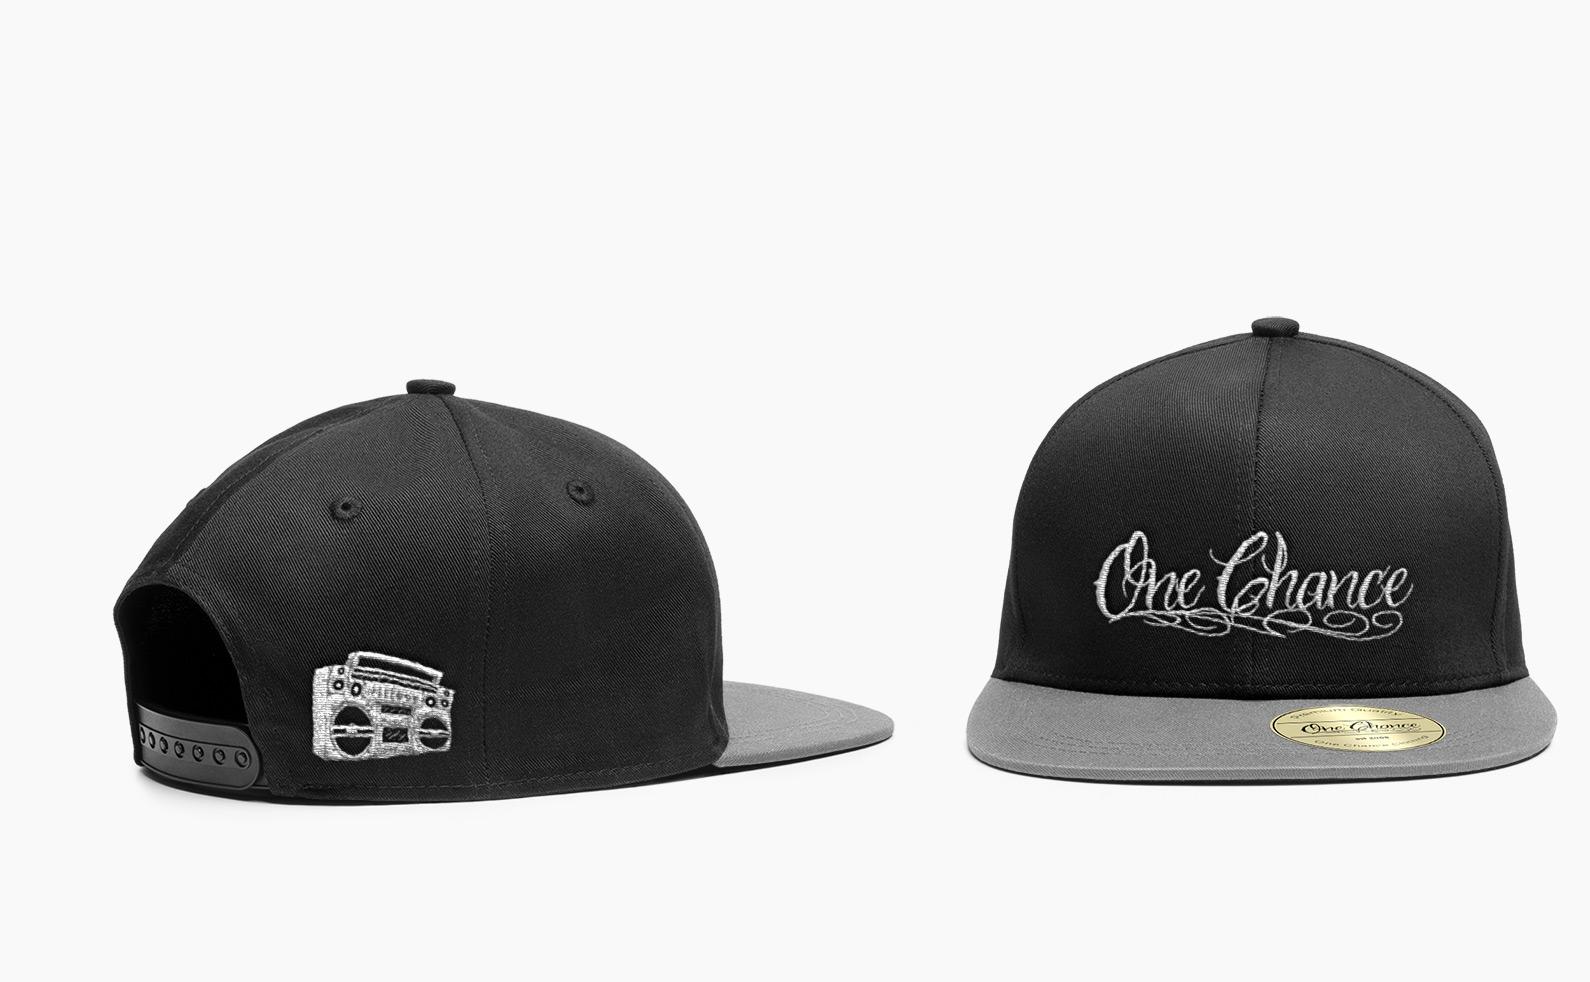 One Chance Product Development - Hats